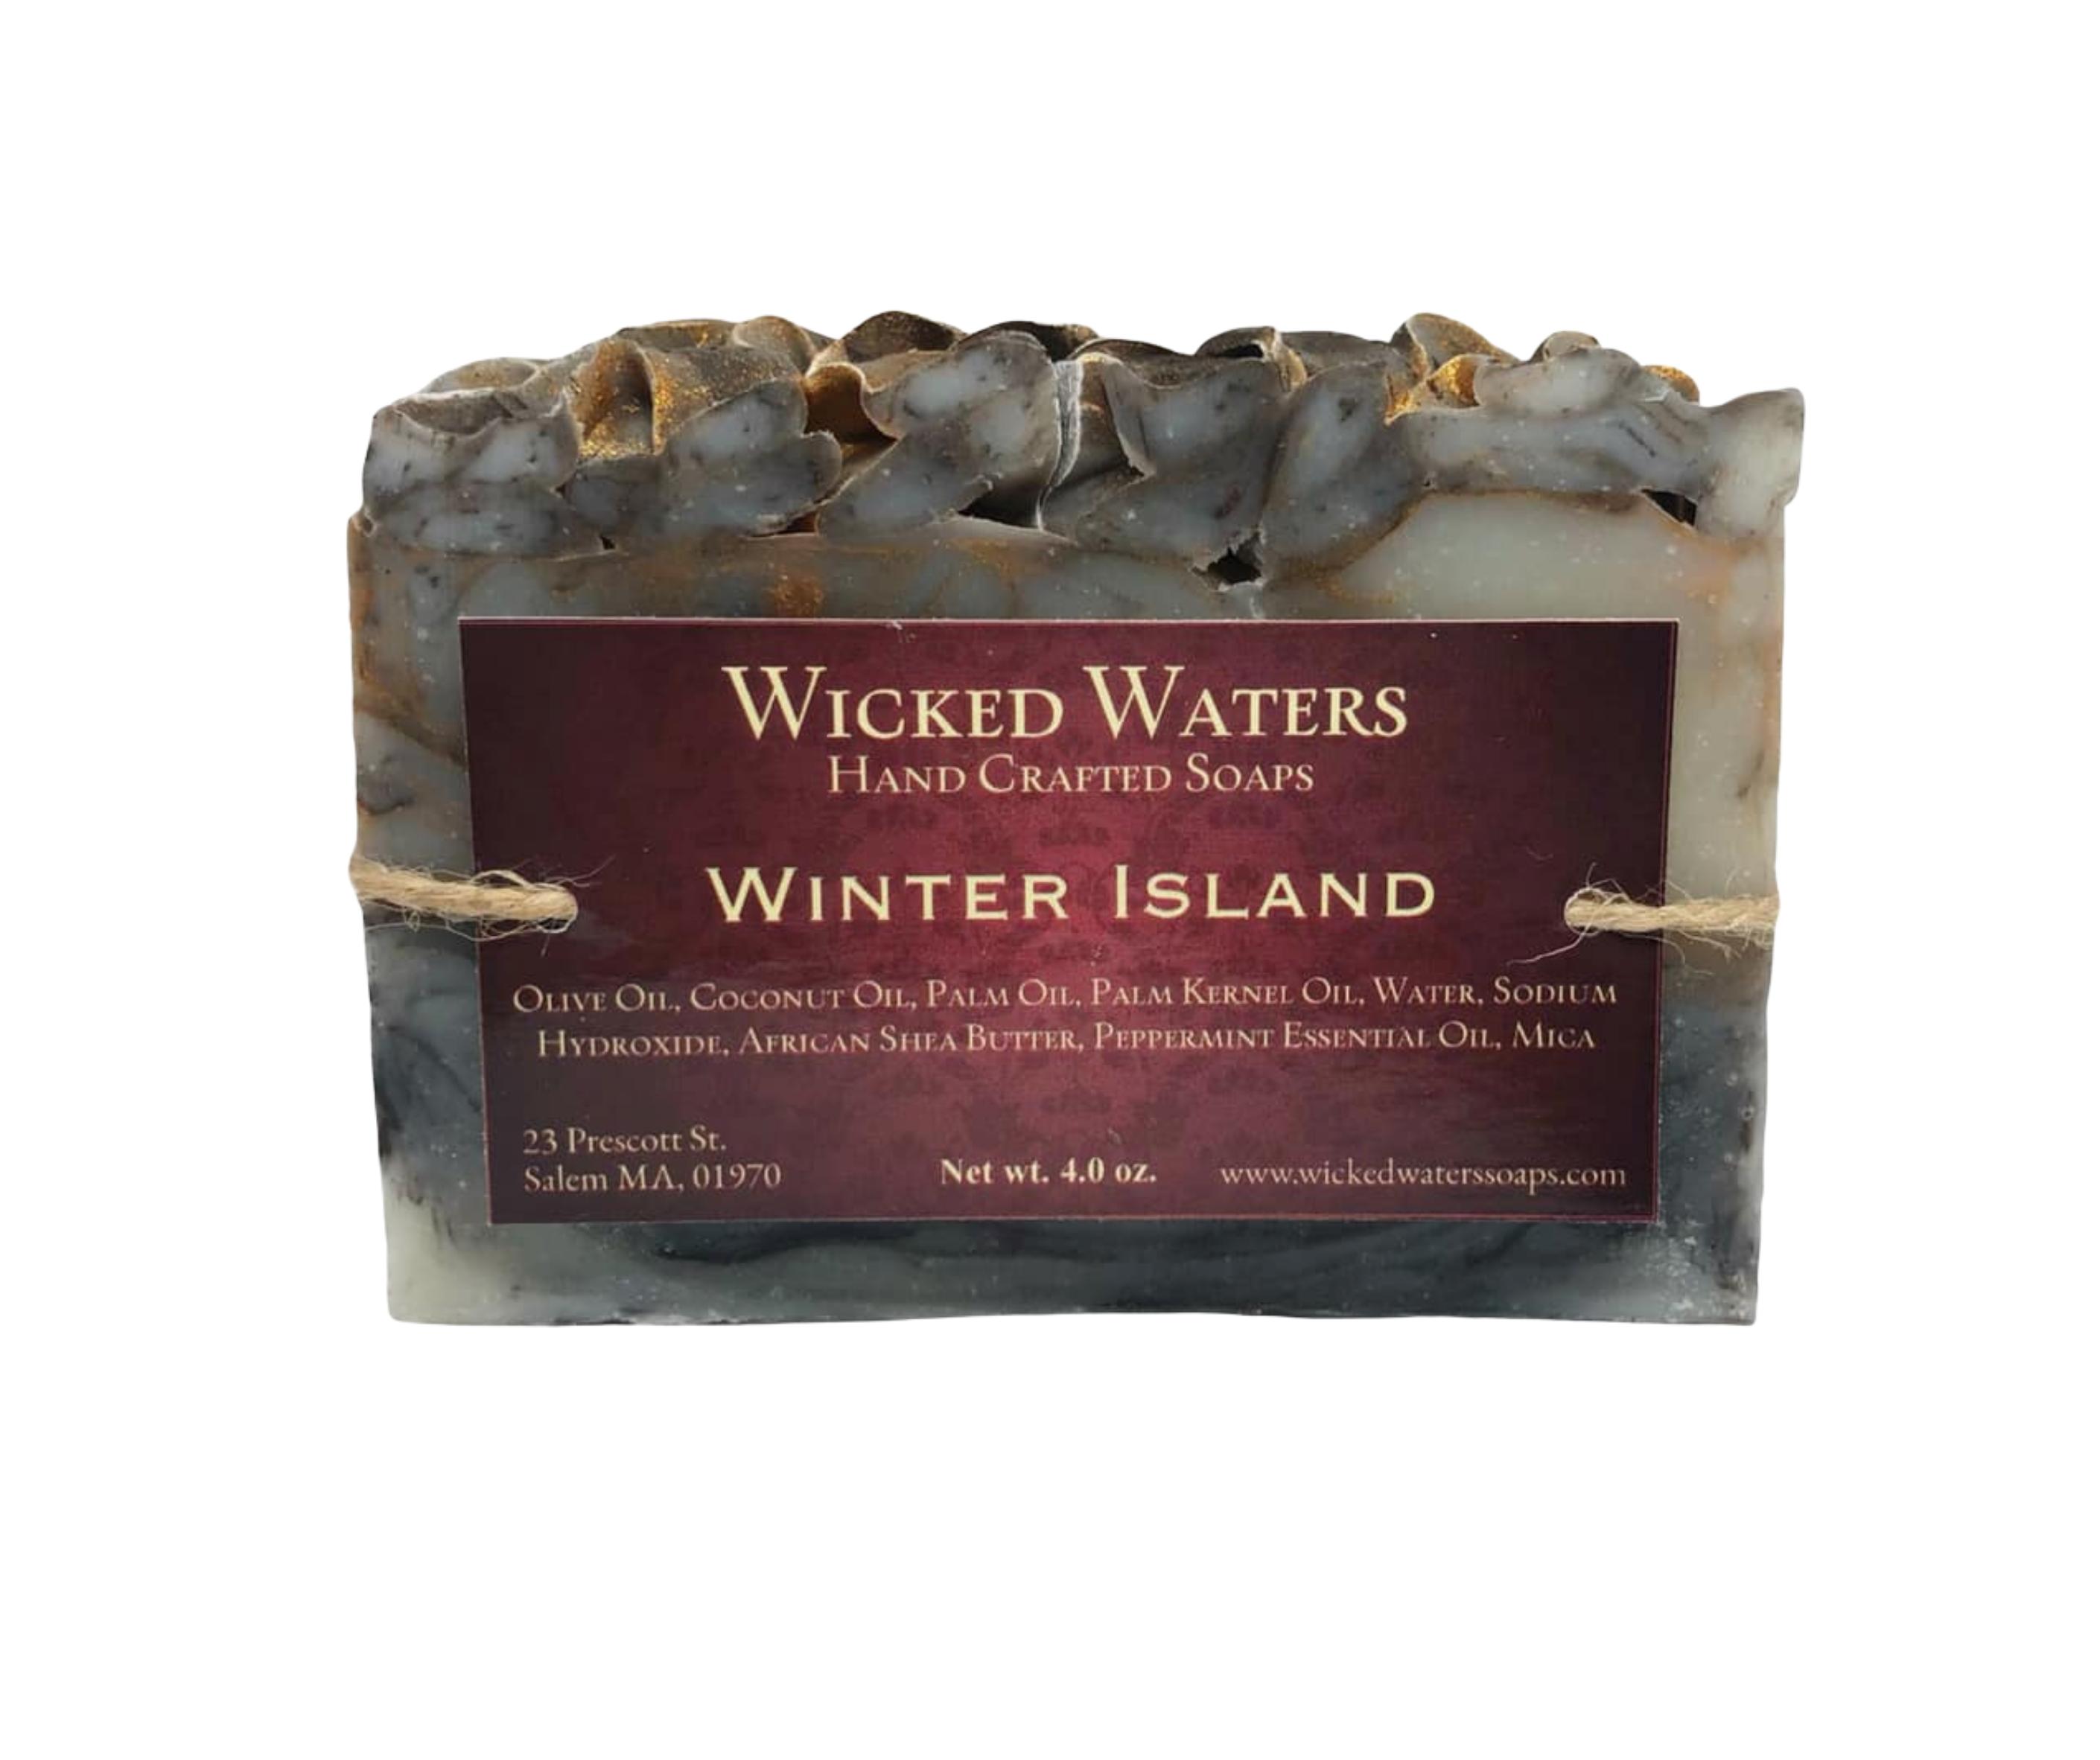 winter island label 2820 X 2364